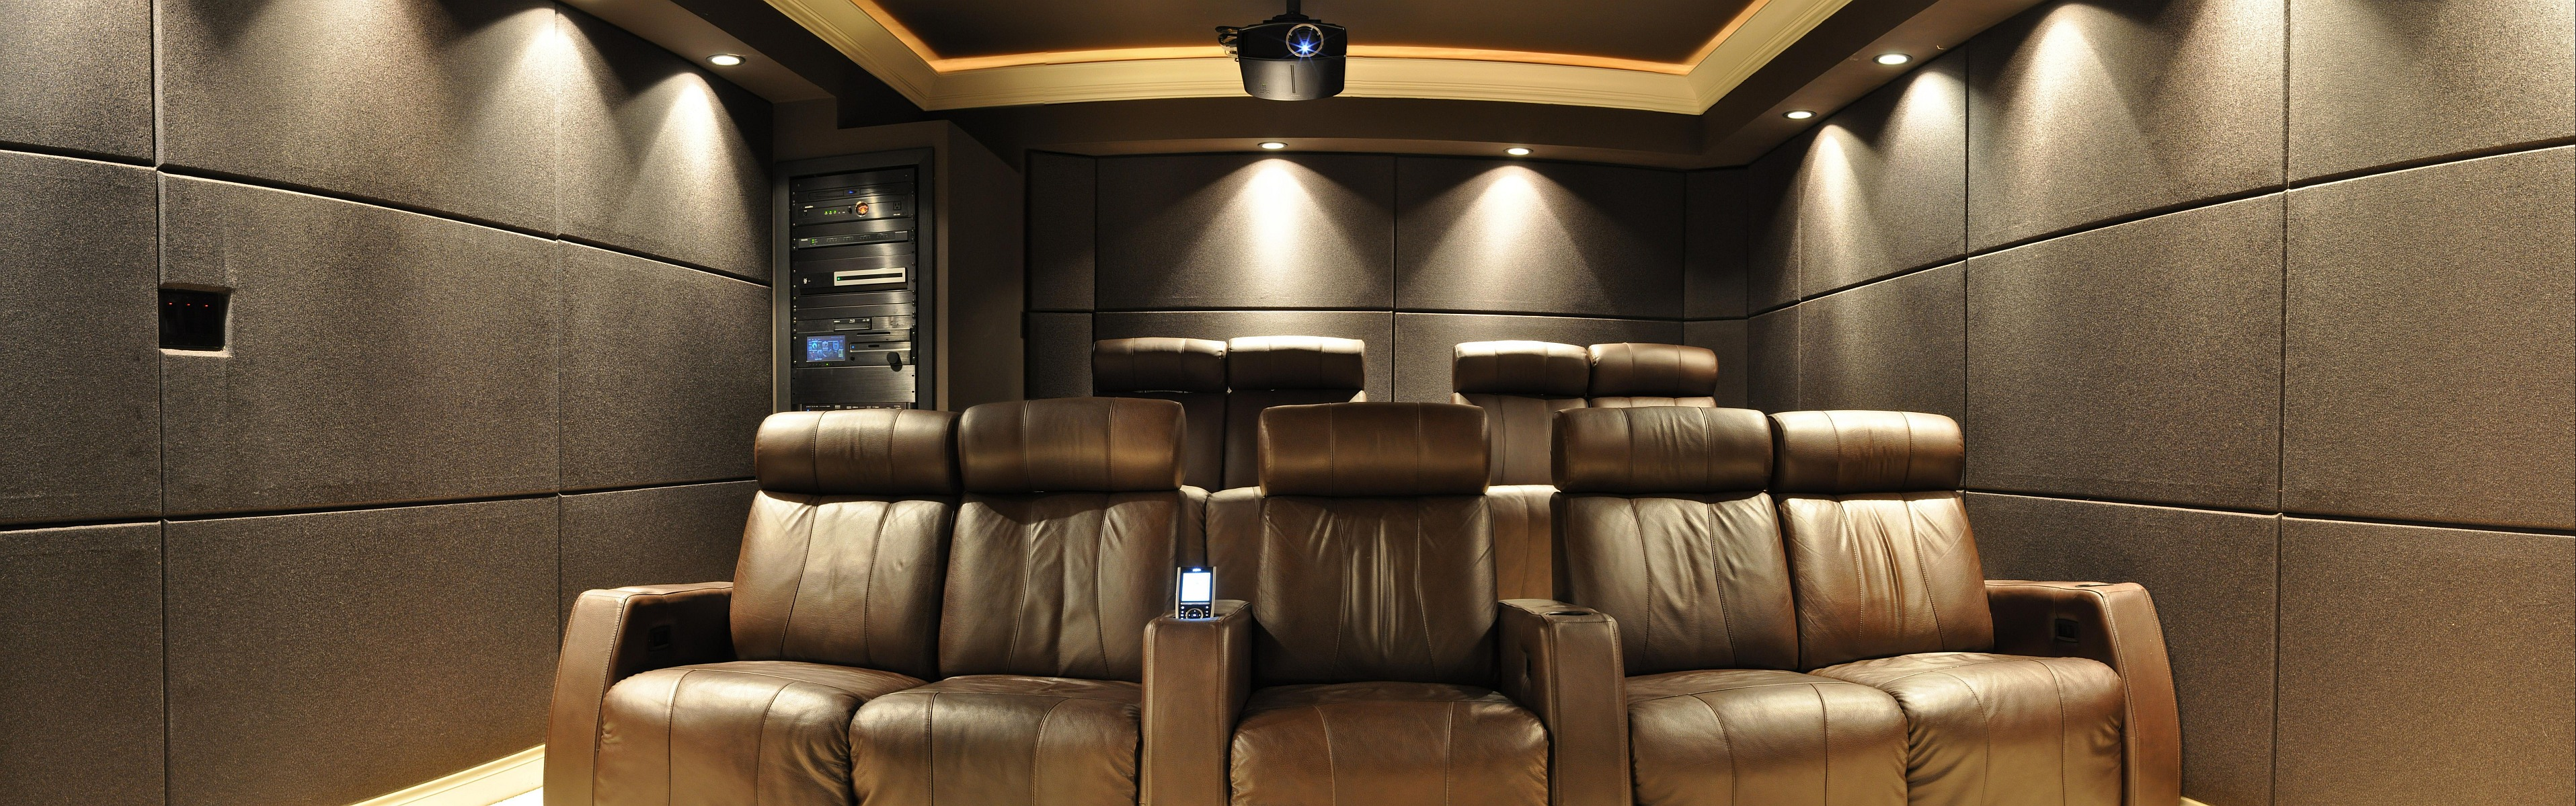 home theatre sofas india moud sofa carltonbale  theater